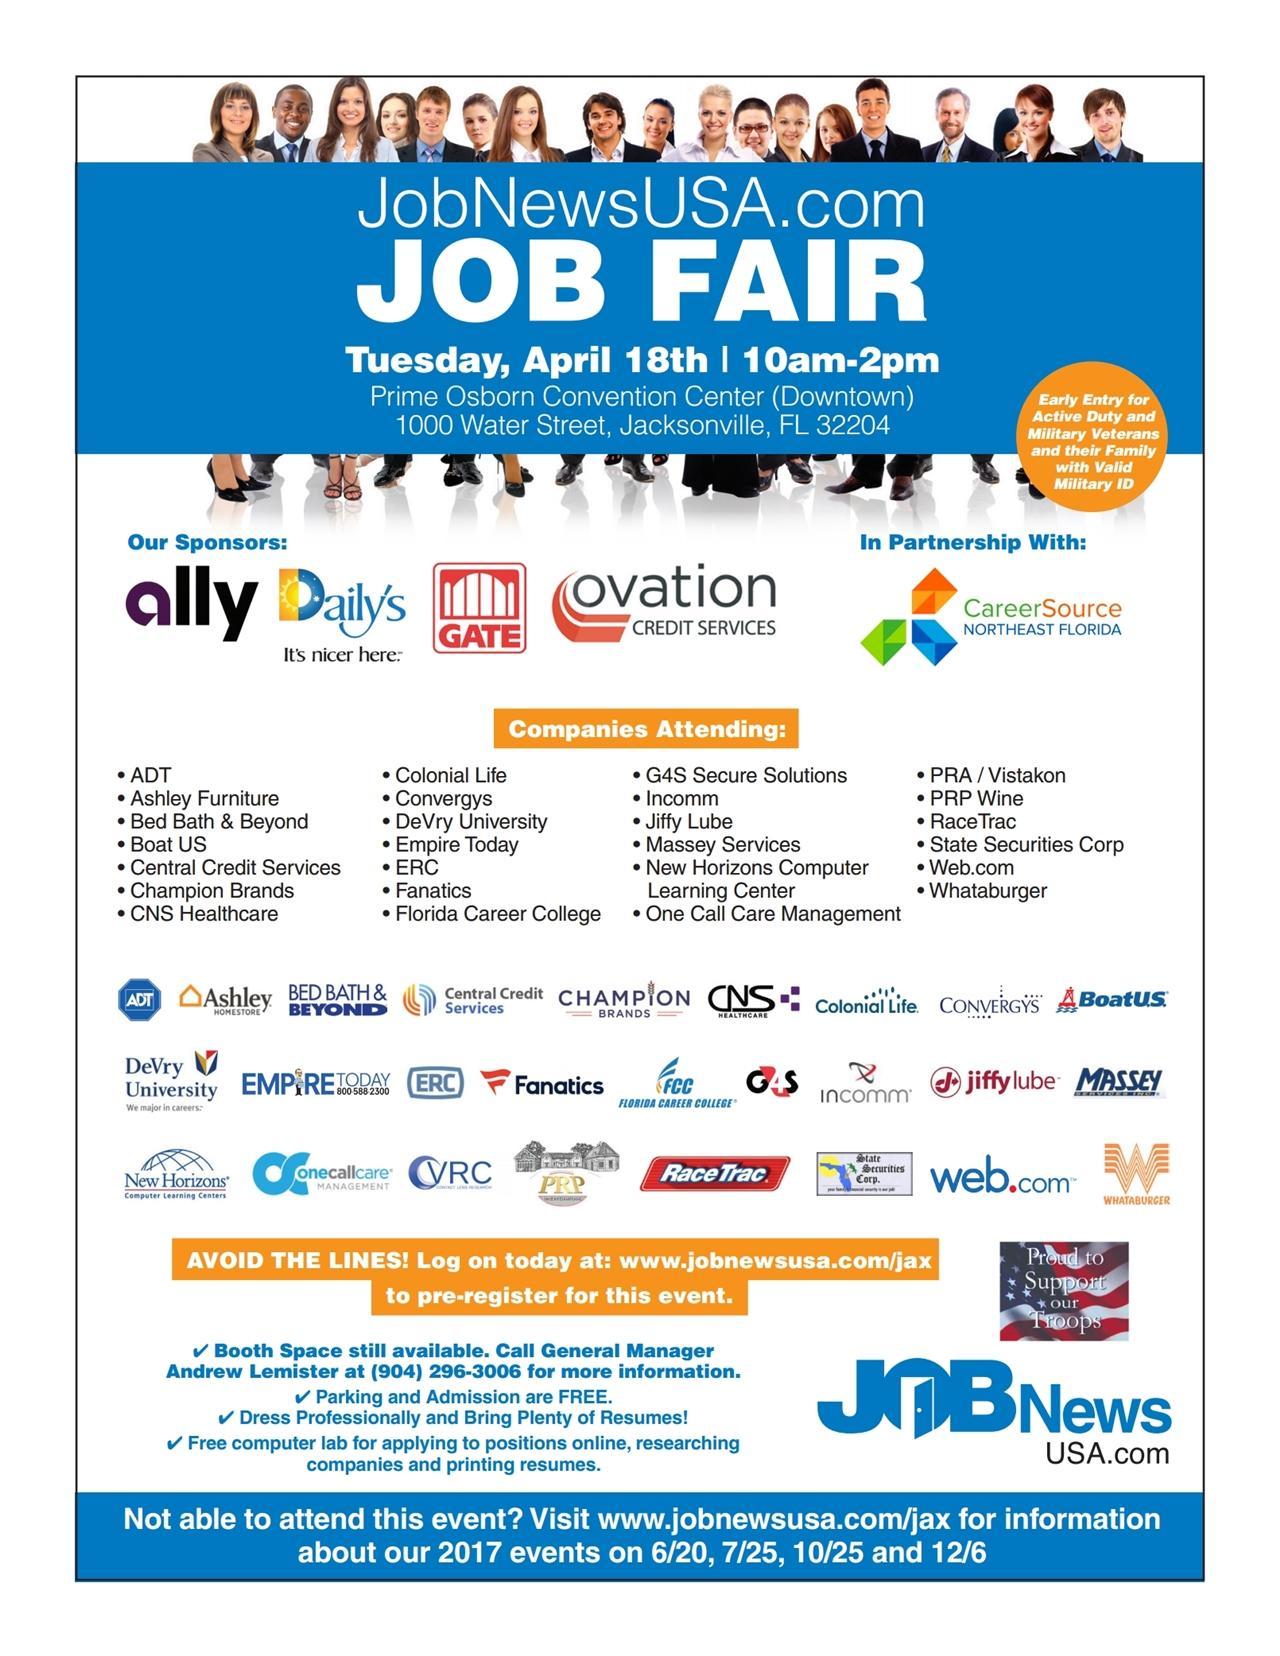 huge job fair prime osborn convention center huge job fair 18 2017 prime osborn convention center jacksonville 18 apr 2017